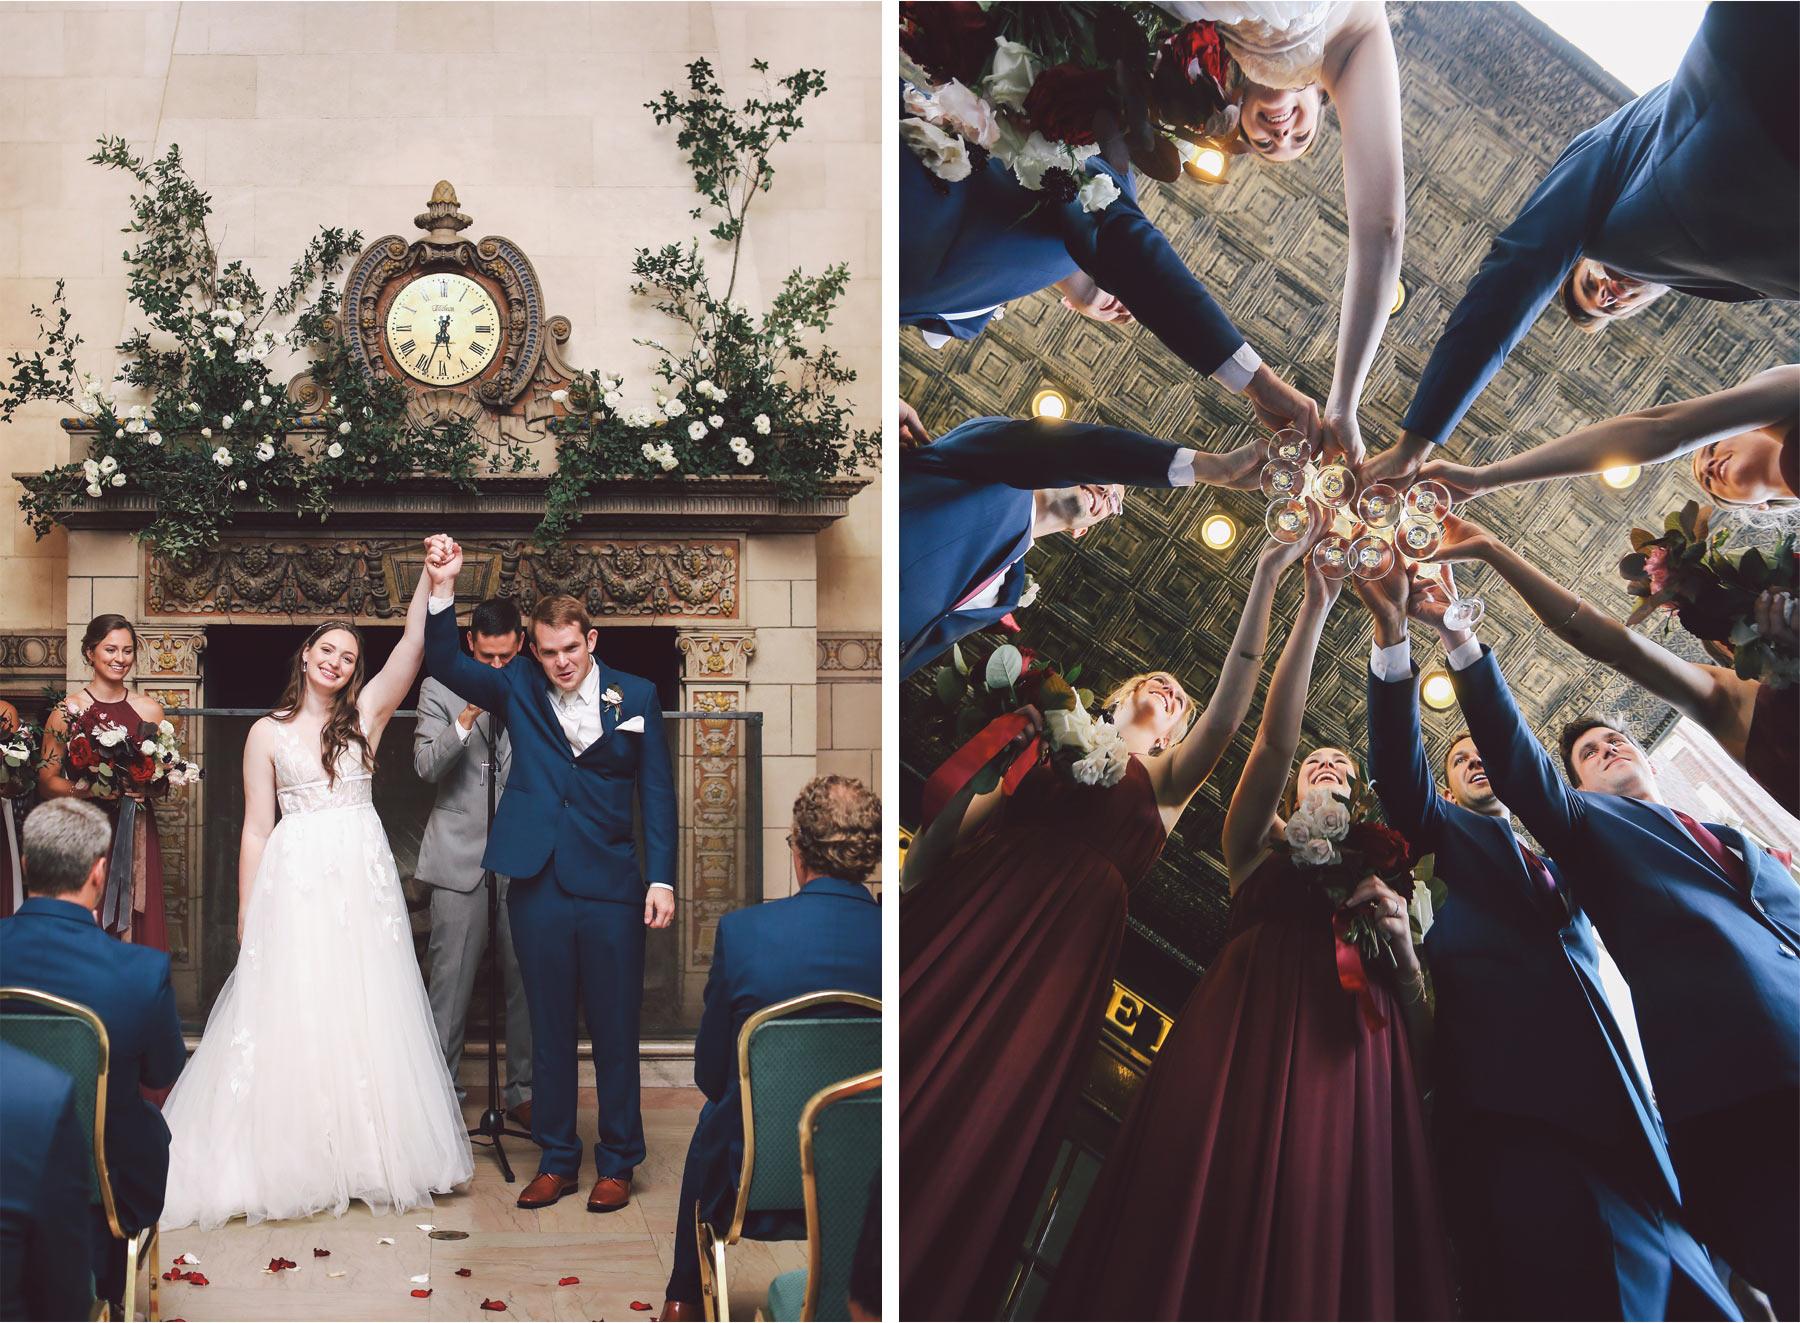 16-Saint-Paul-Minnesota-Wedding-Photography-by-Vick-Photography-Saint-Paul-Athletic-Club-Ceremony-Toast-Kelsey-and-Jeffery.jpg